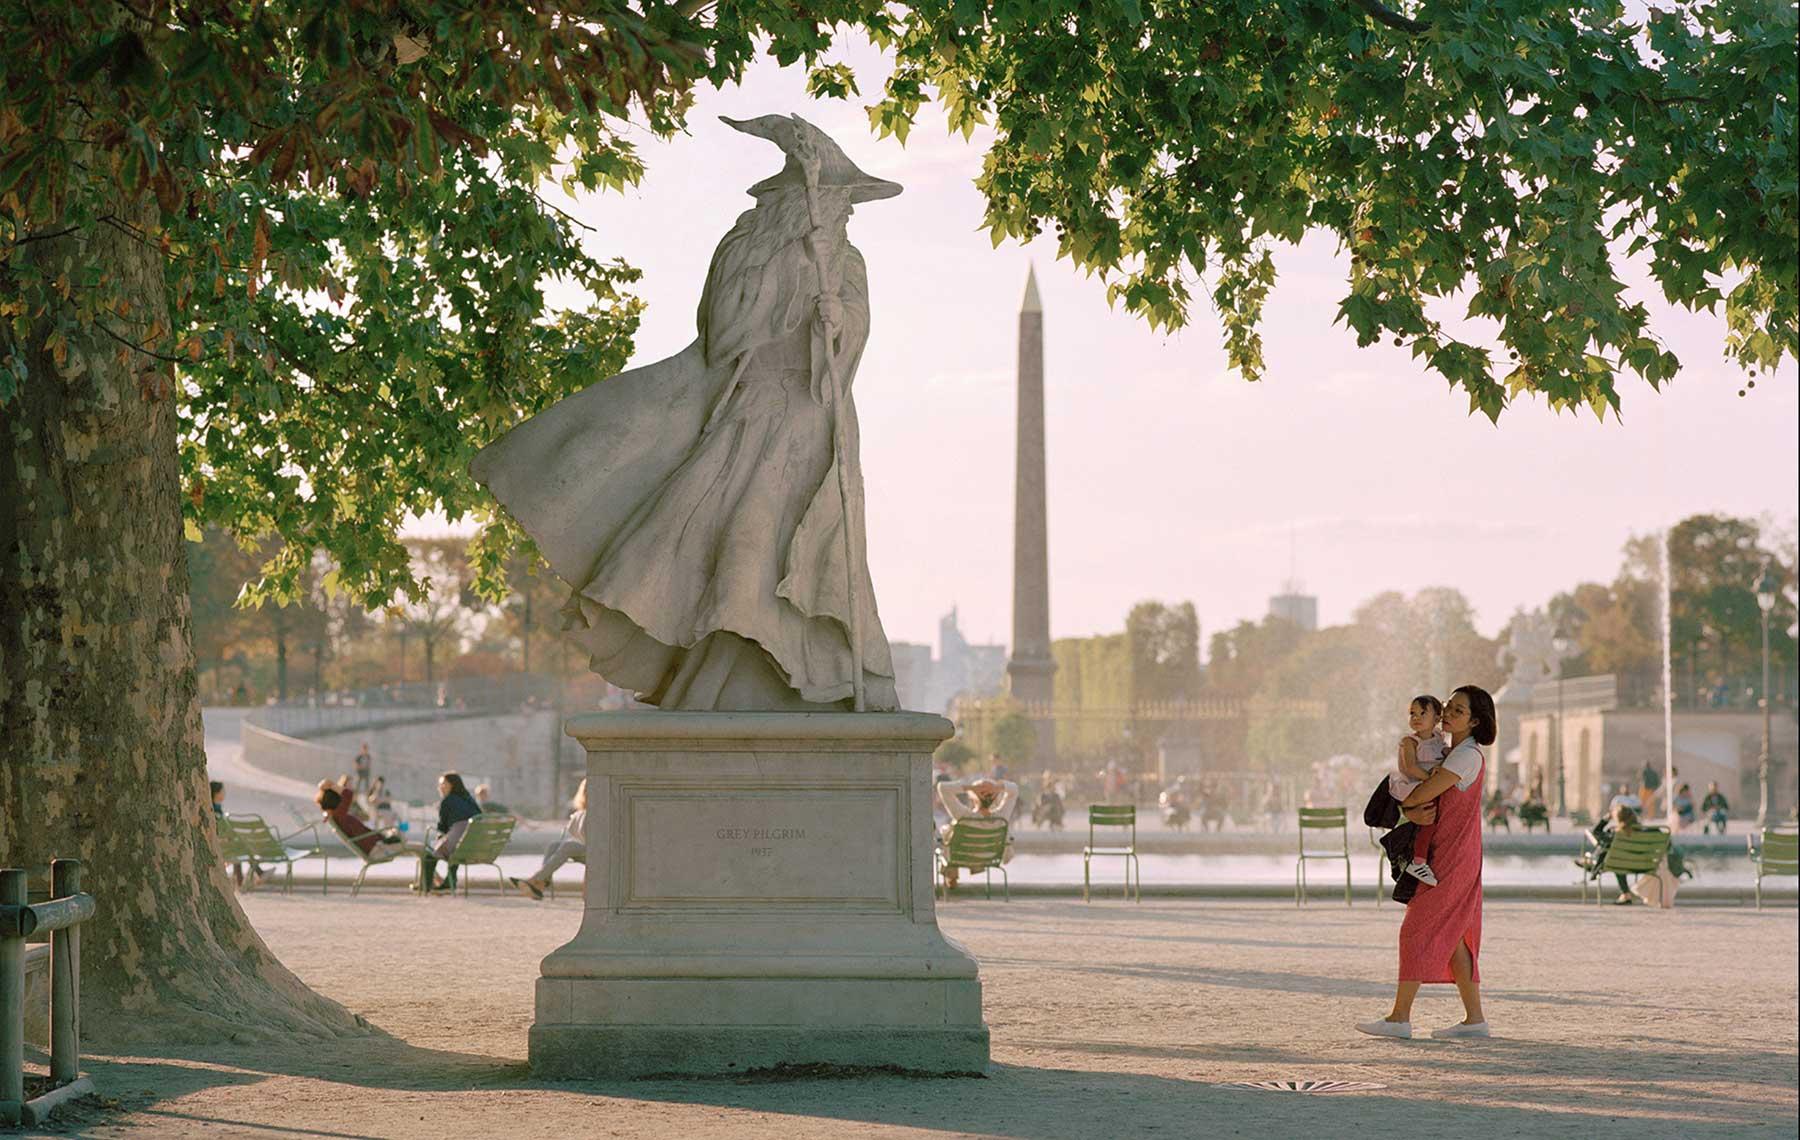 Popkulturen-Statuen